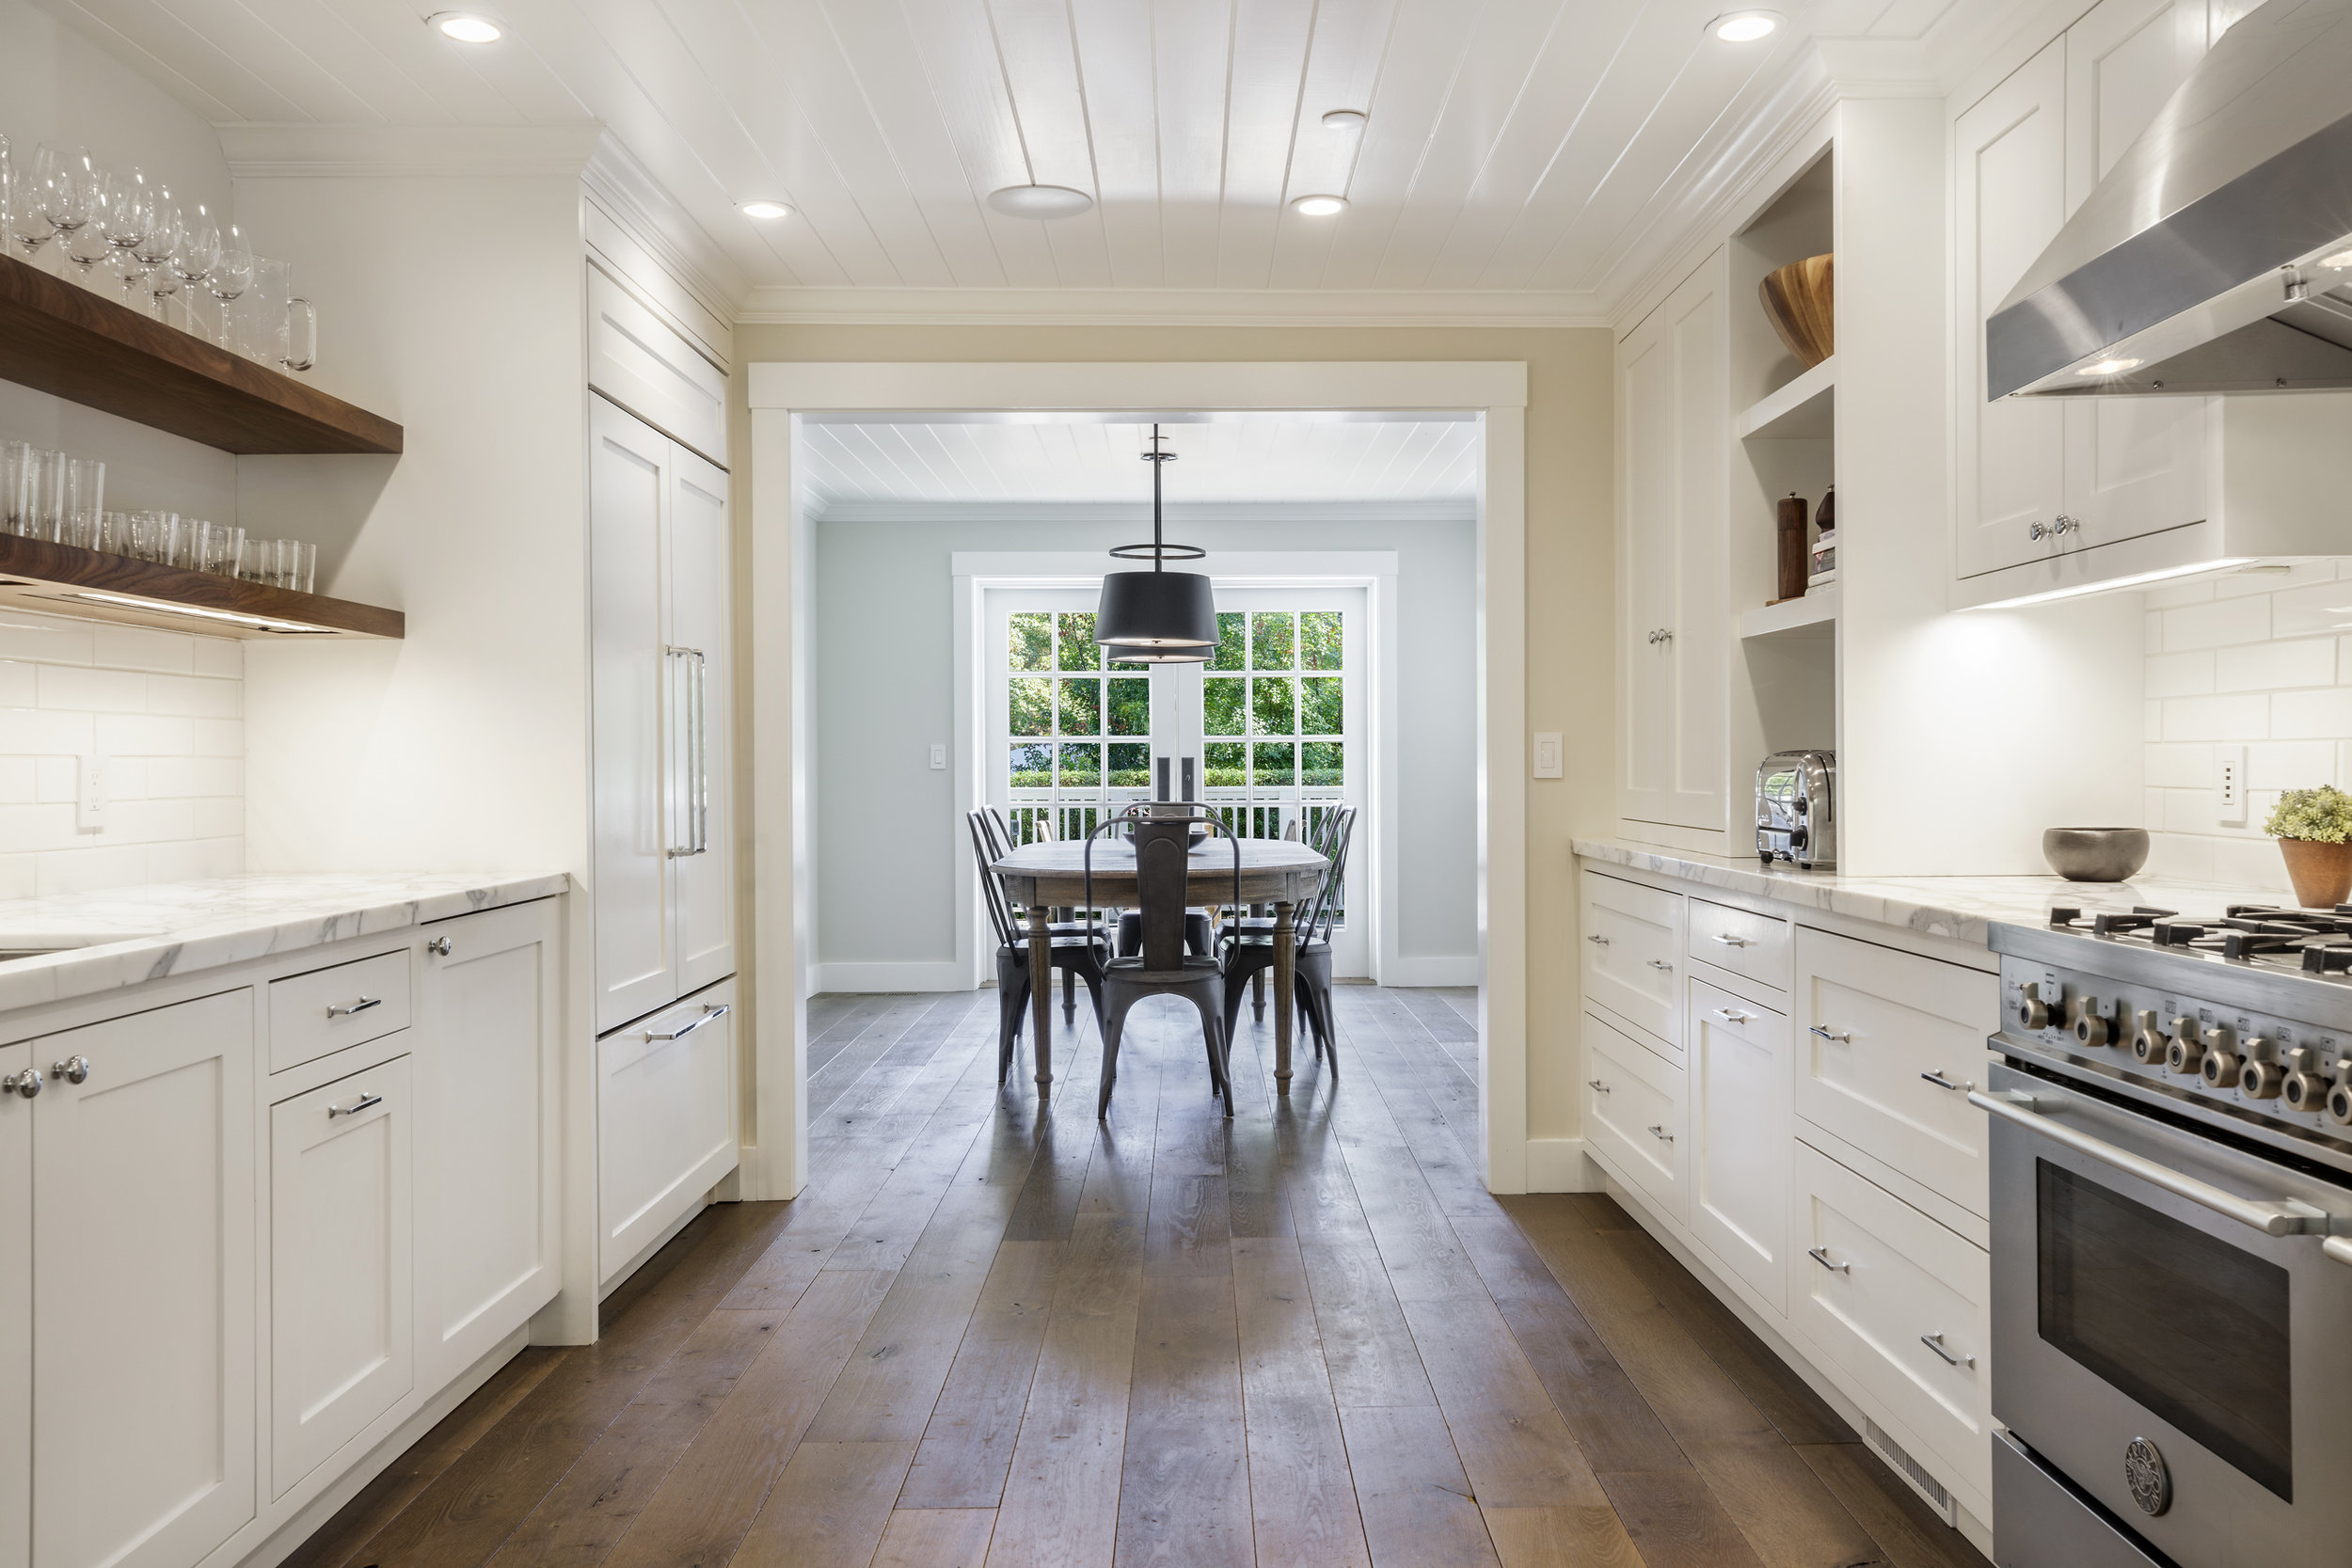 48-Raymond-Ave-San-Rafael-kitchen-3834-high-res.jpg